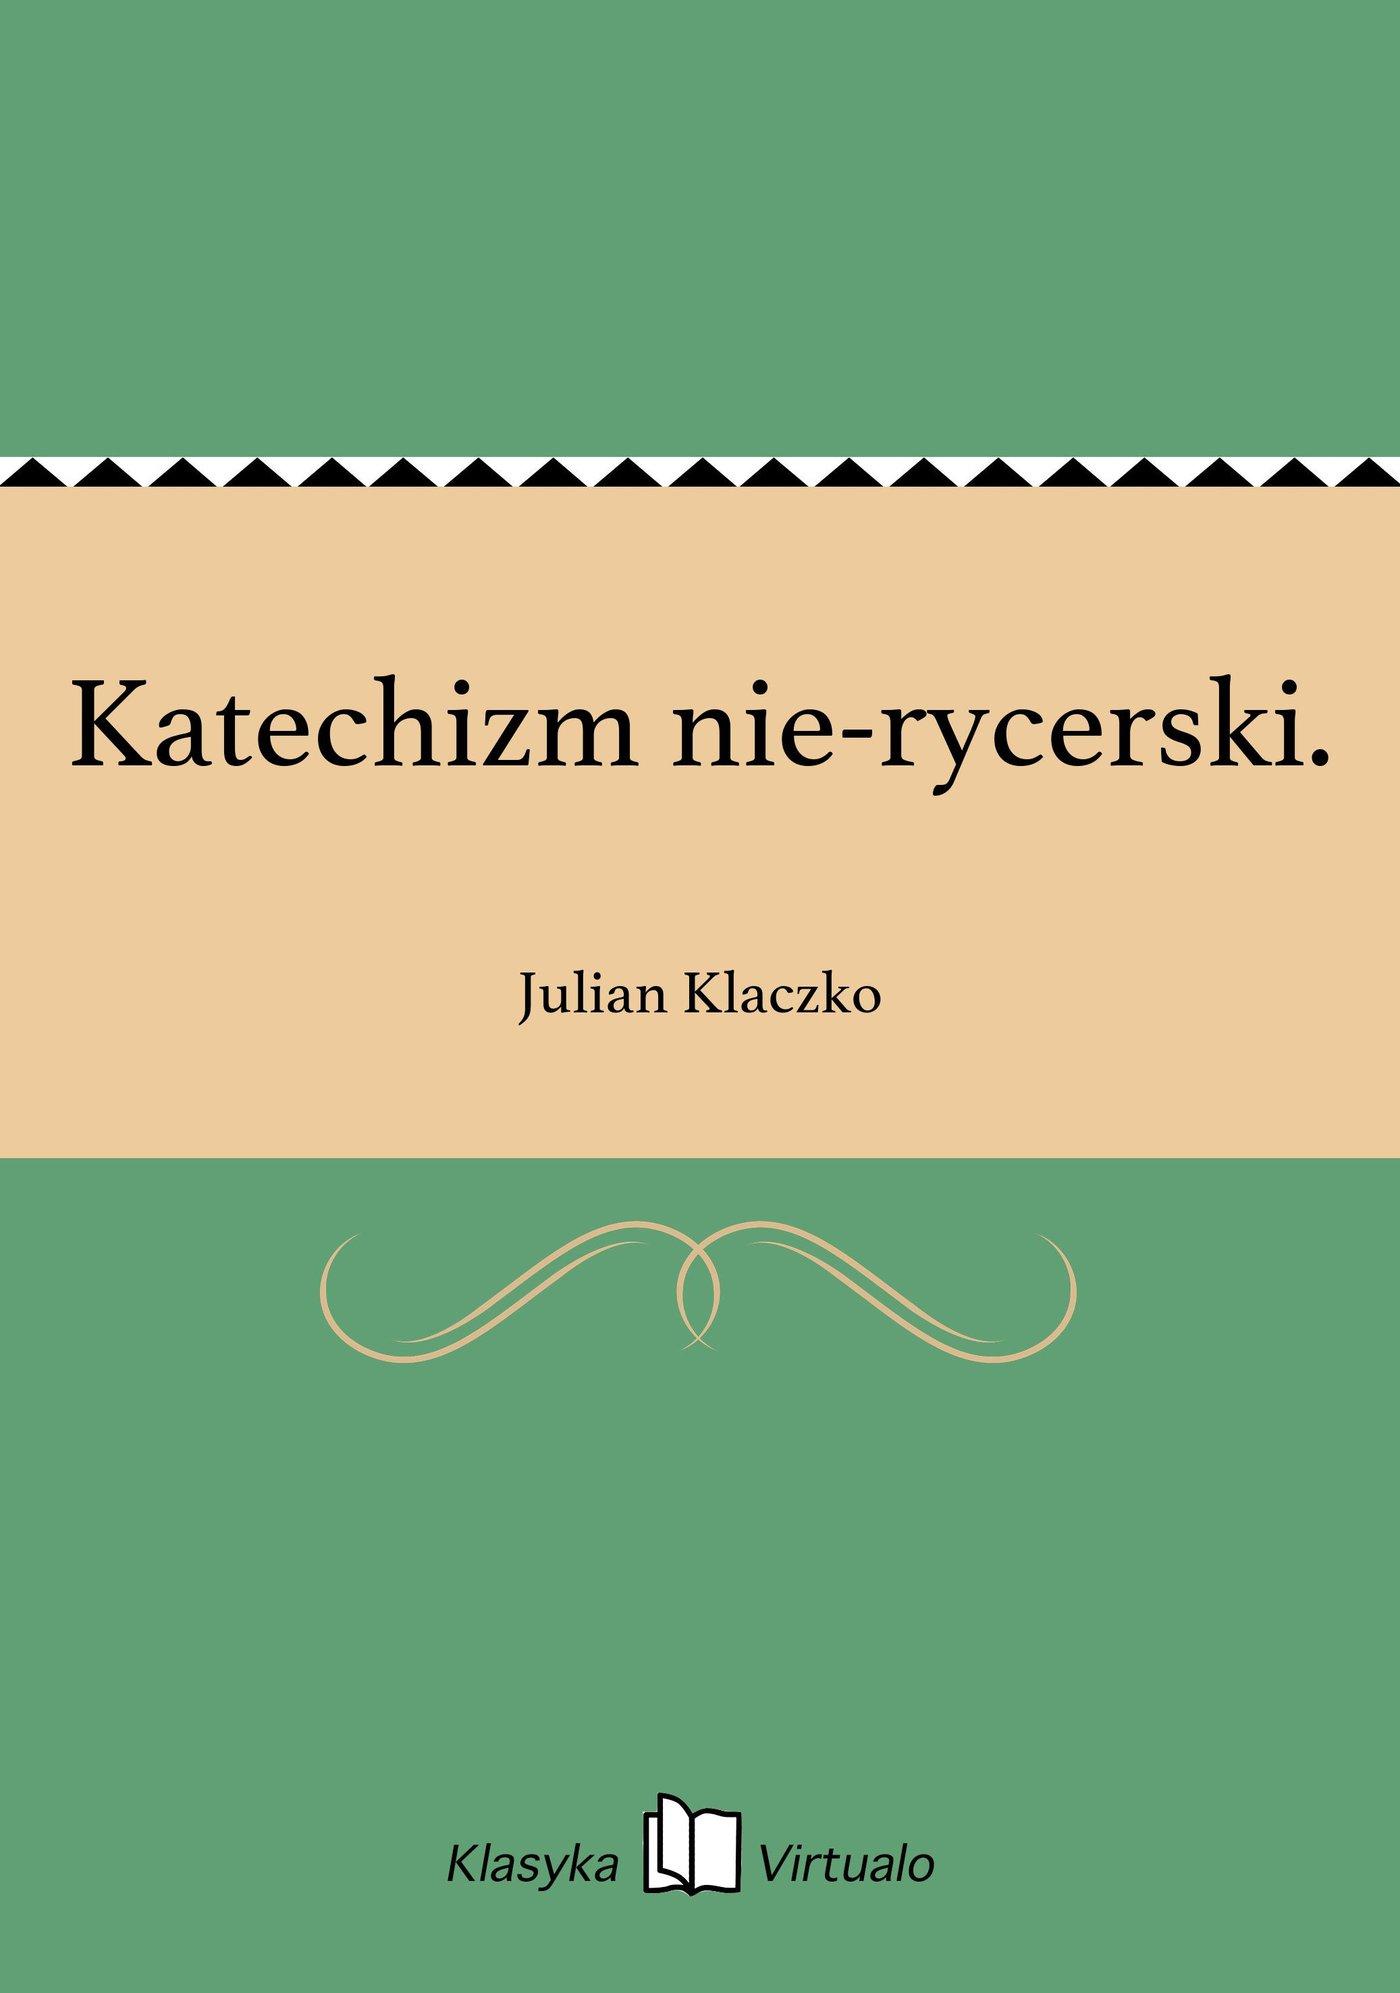 Katechizm nie-rycerski. - Ebook (Książka EPUB) do pobrania w formacie EPUB